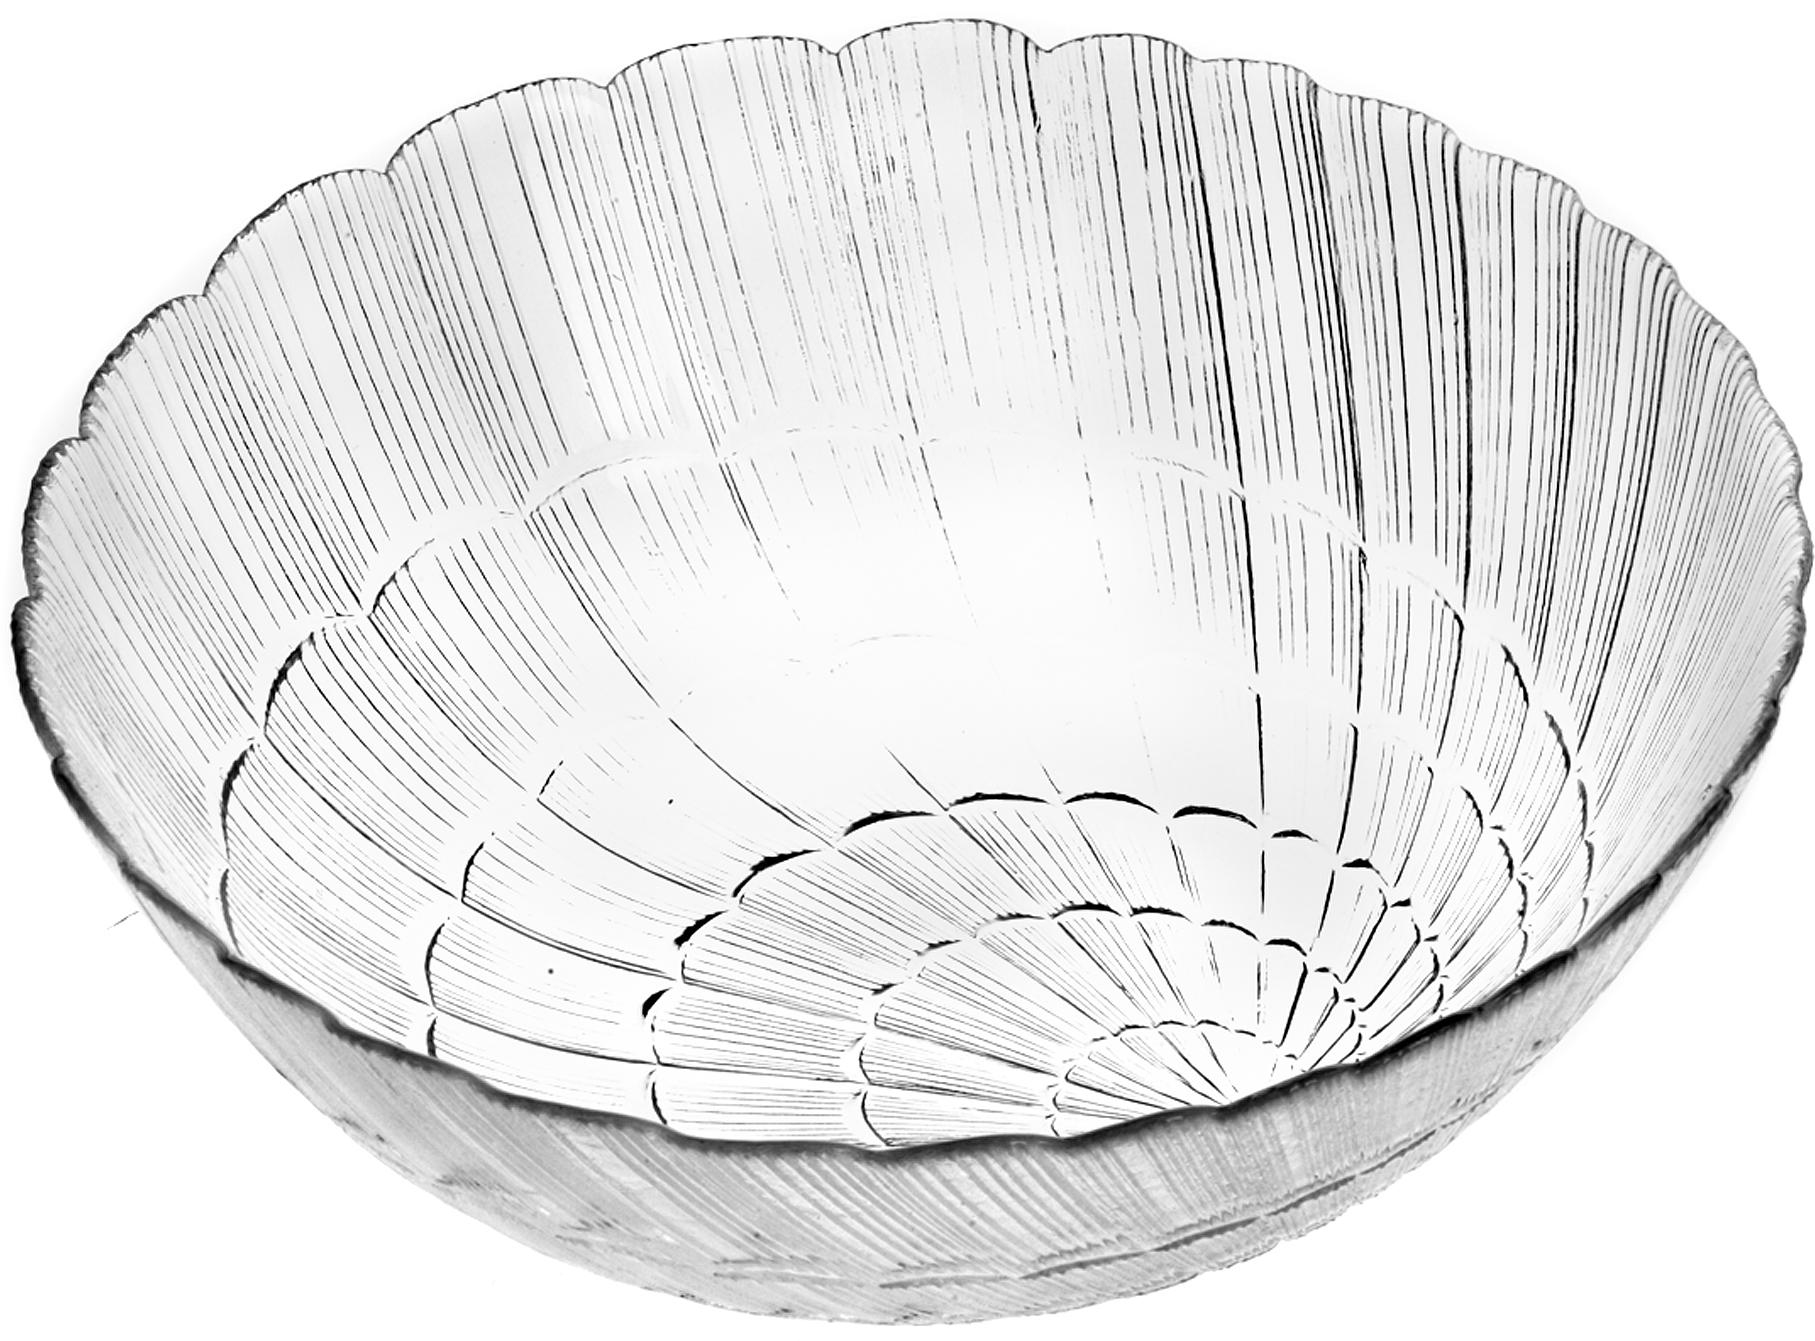 Салатник Pasabahce Атлантис, цвет: прозрачный, диаметр 27 см тарелка pasabahce атлантис цвет прозрачный диаметр 21 см